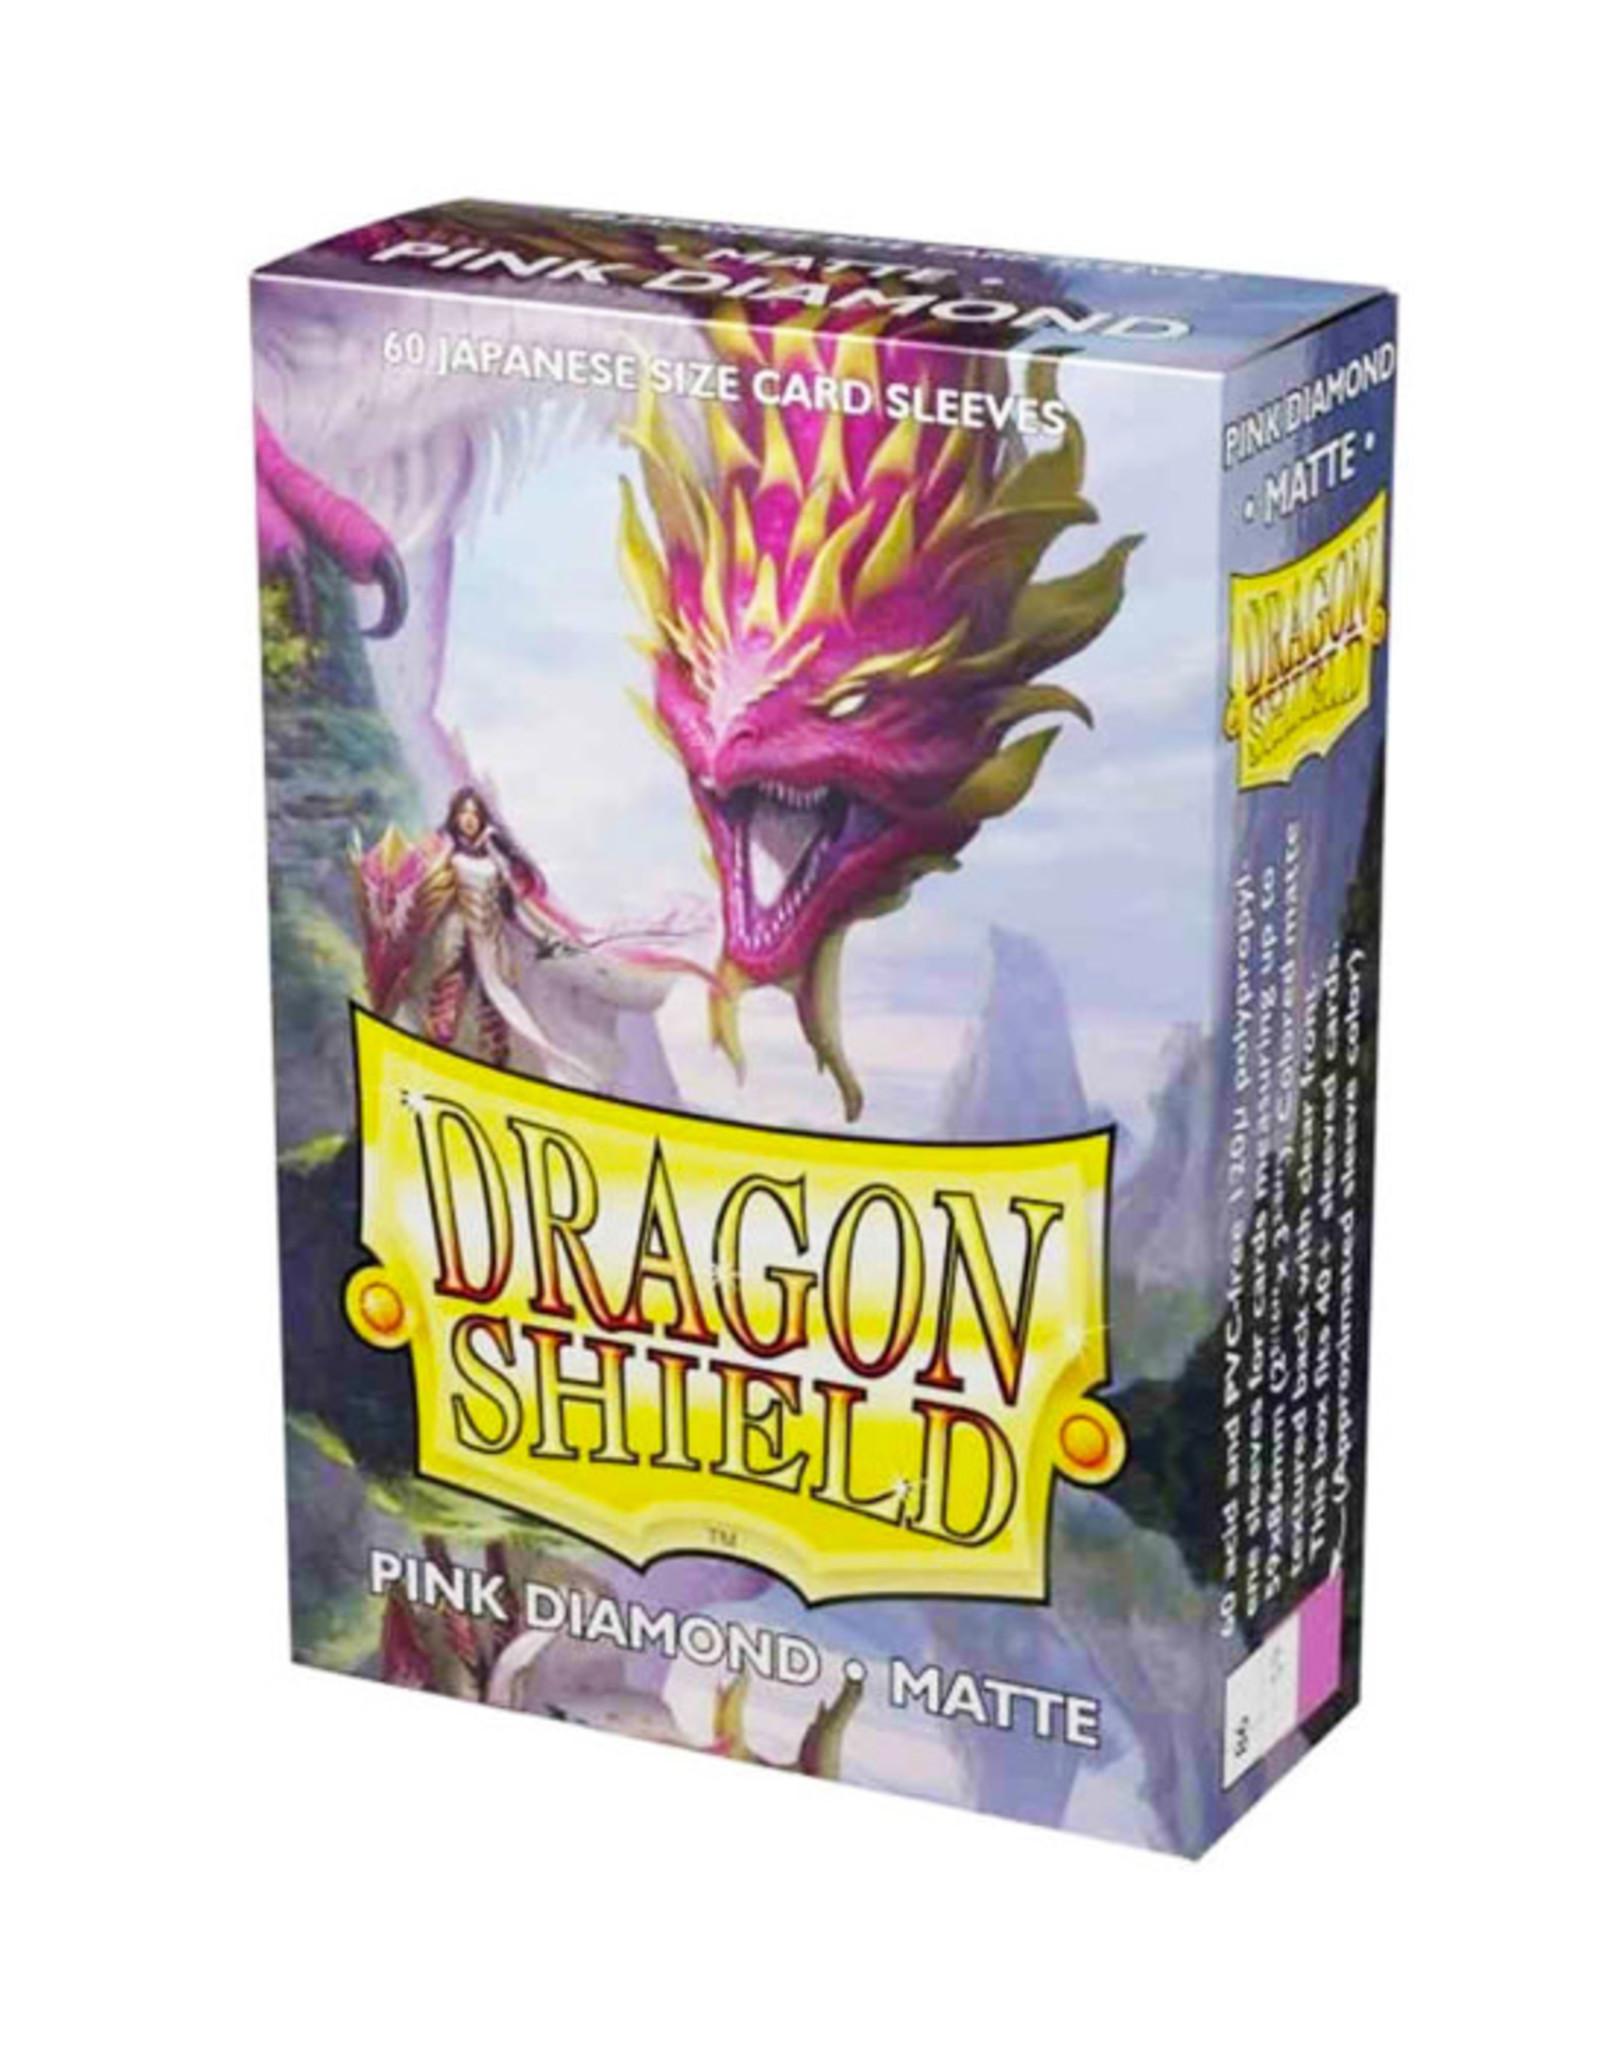 Dragon Shield Dragon Shield: Sleeves - Small - Matte - Pink Diamond (60)